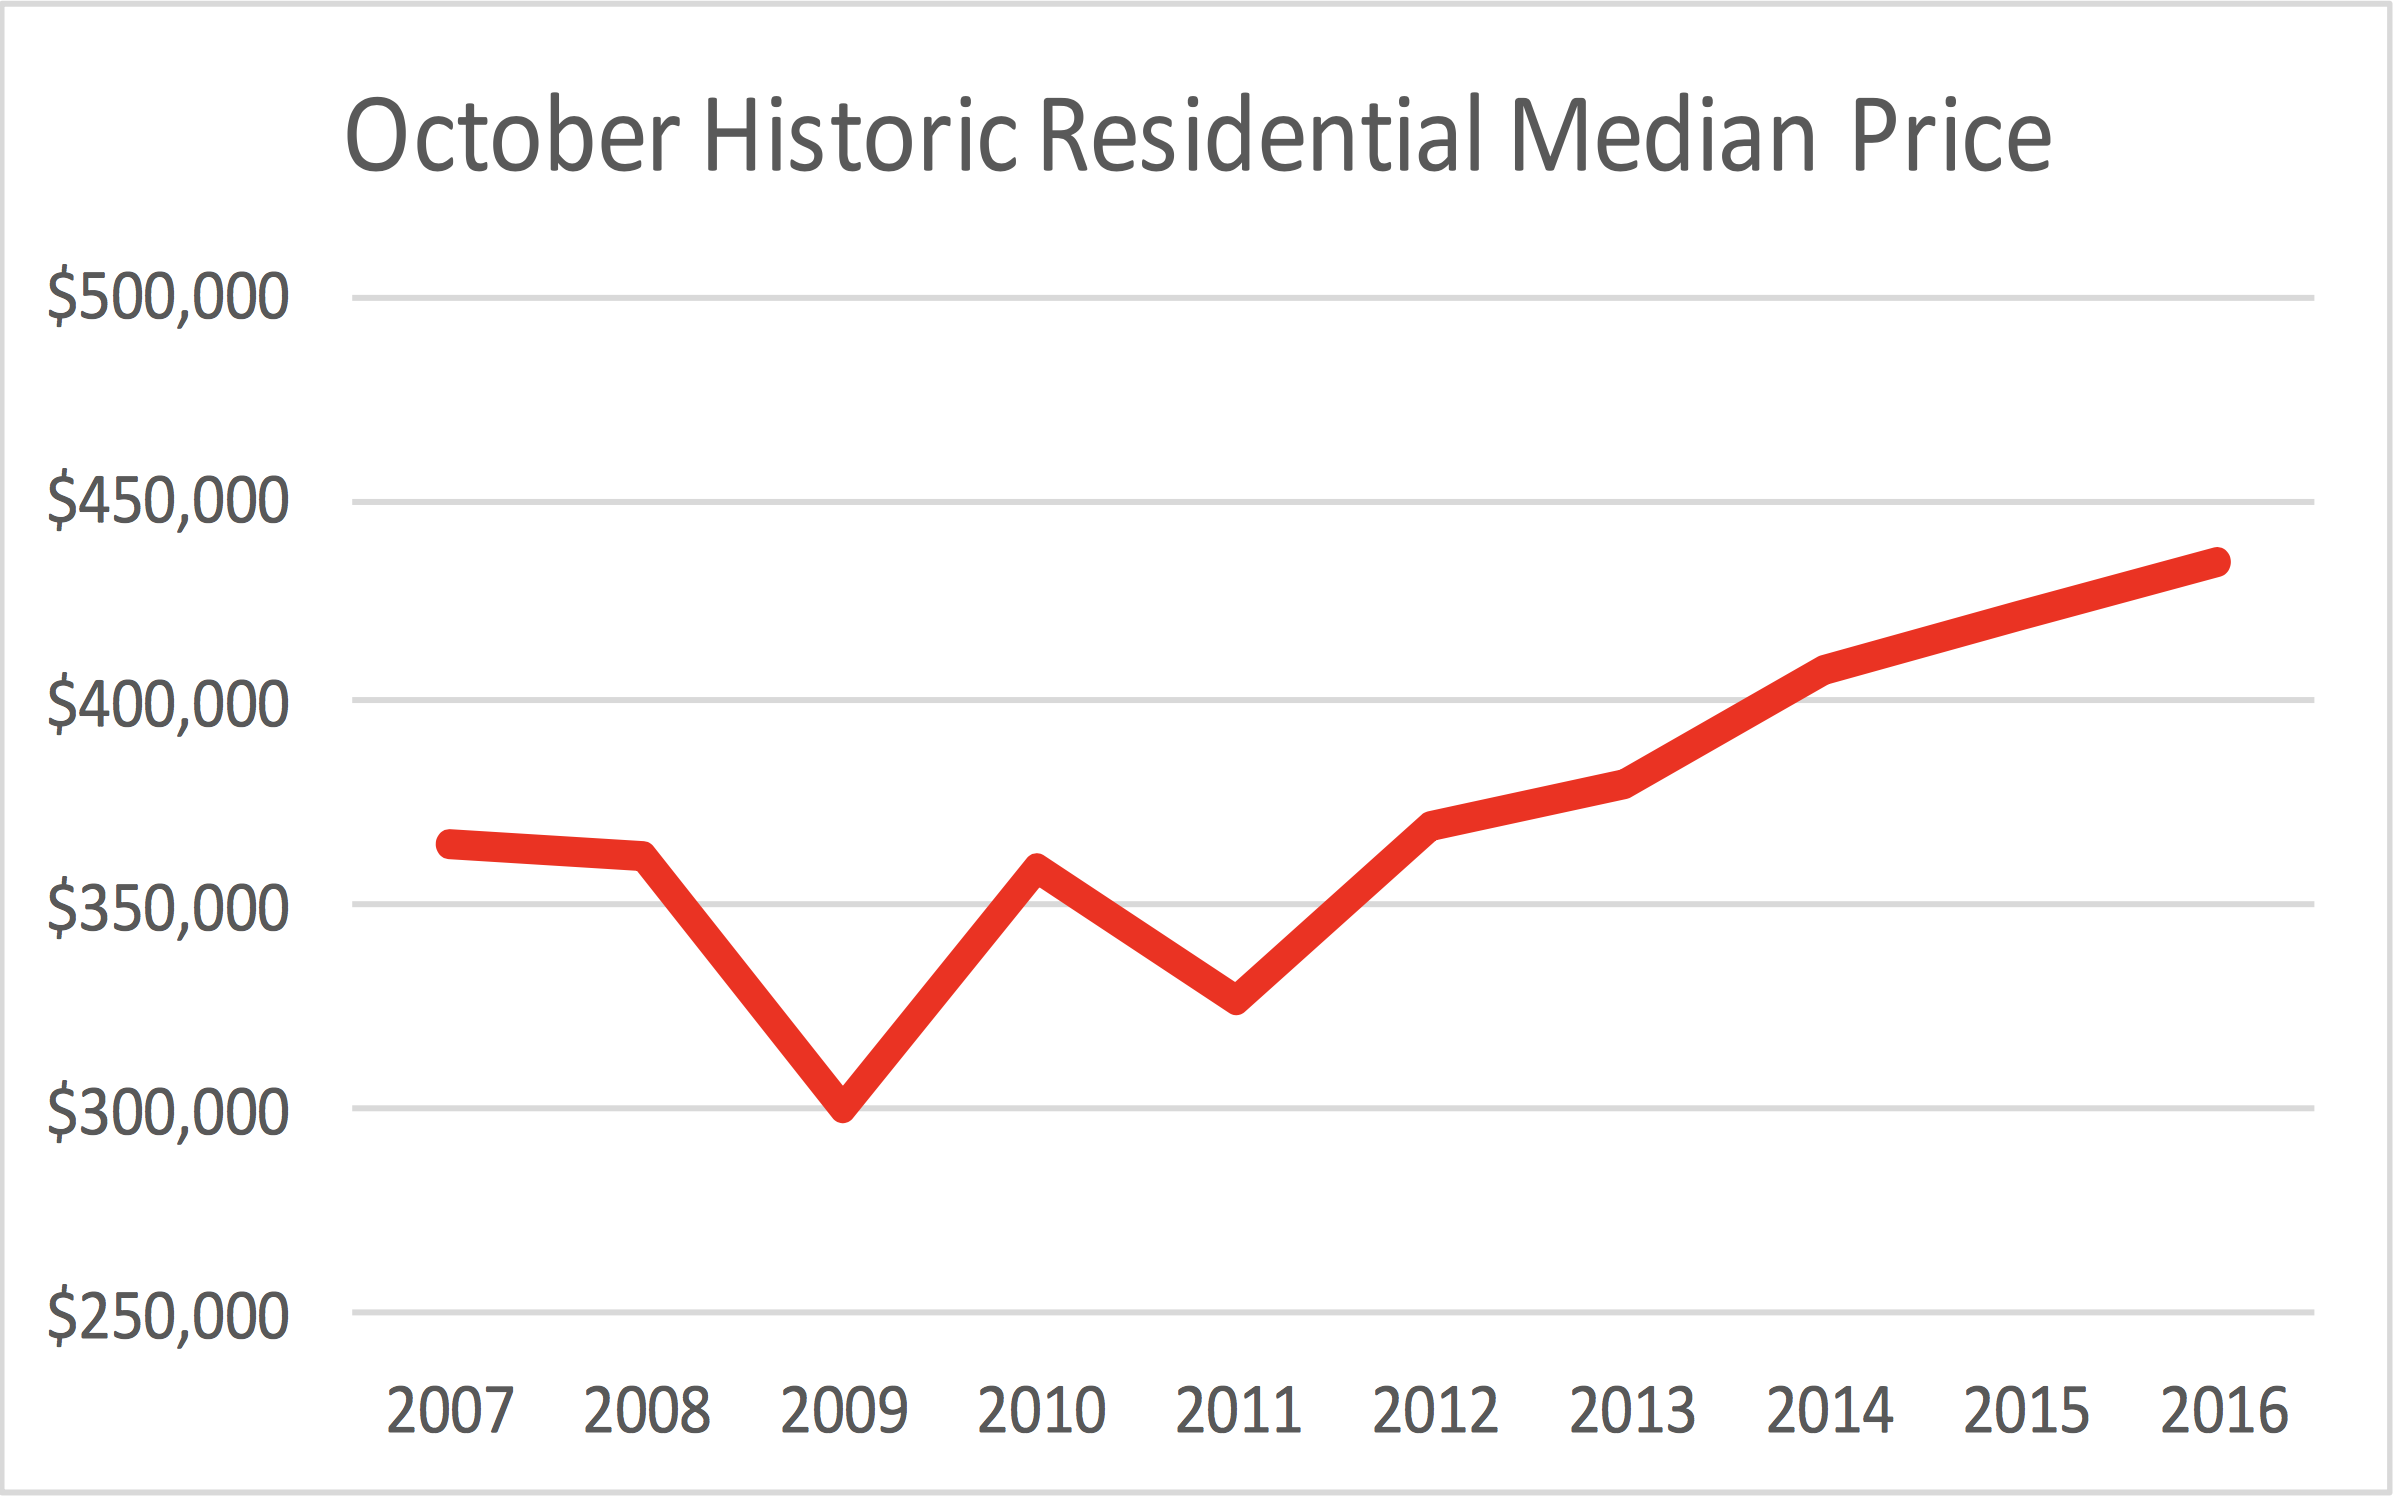 October Historic Residential Median Price